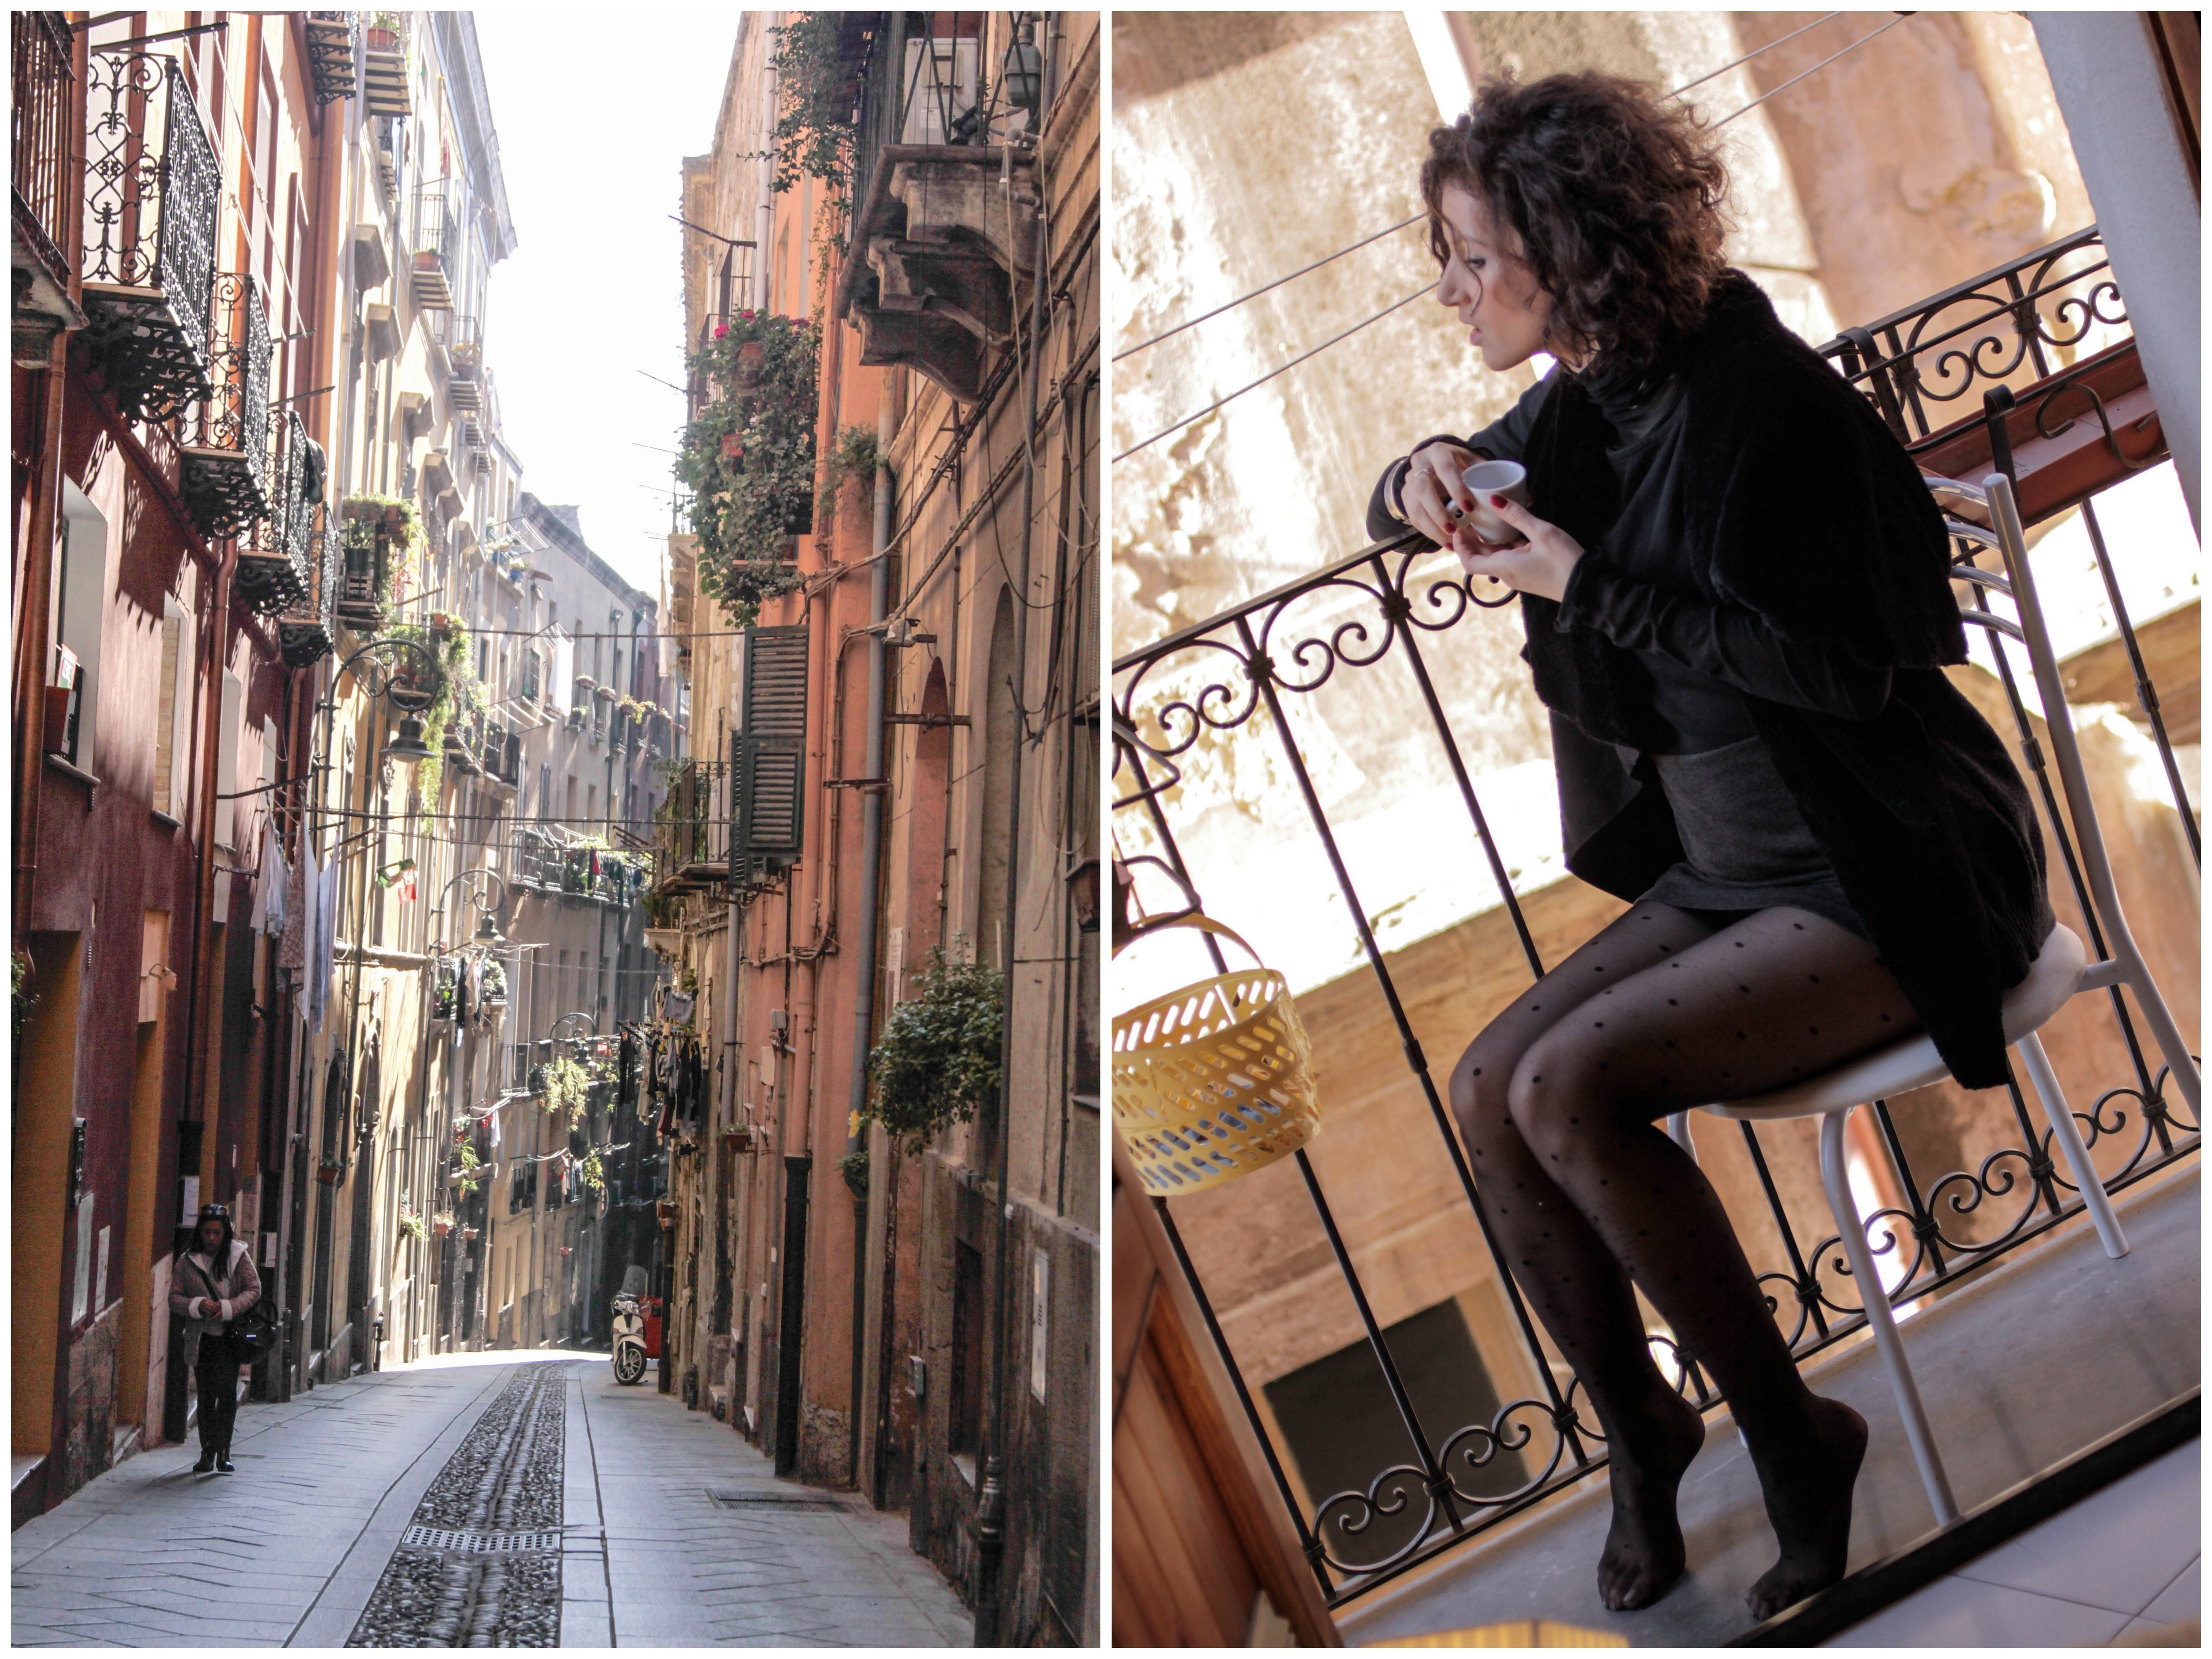 cagliari_balcony_smell_of_jasmine